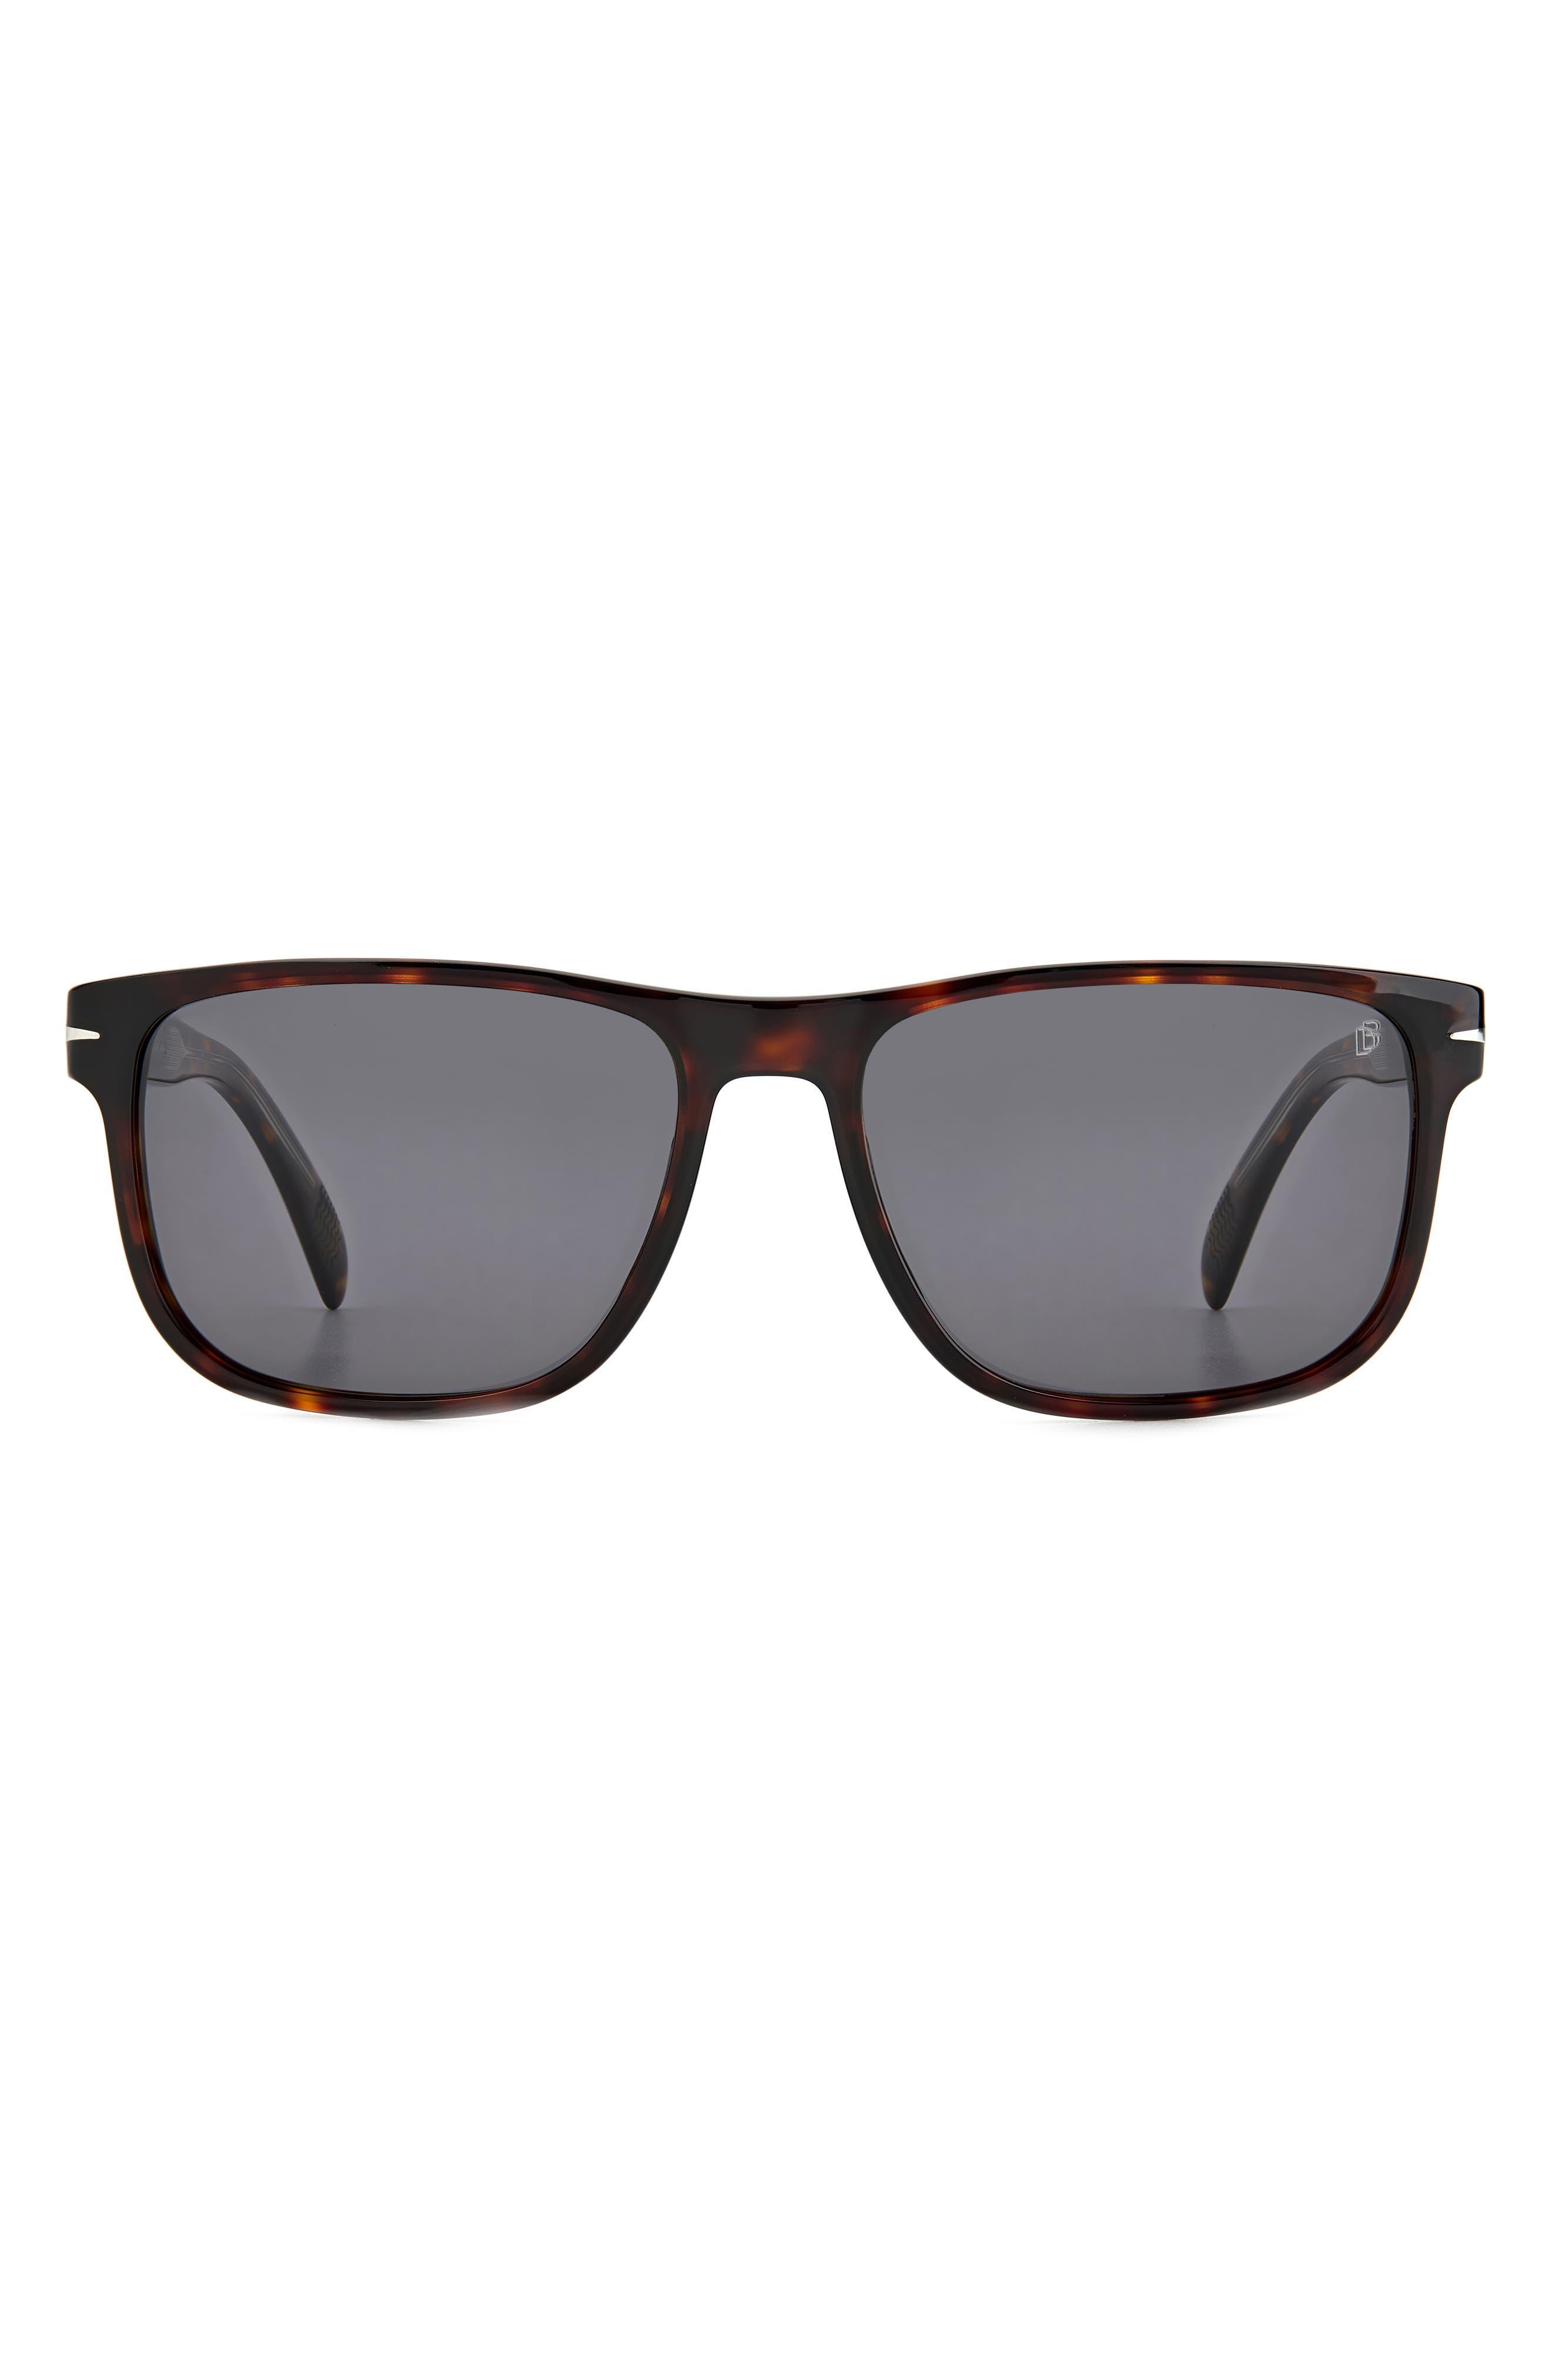 57mm International Fit Rectangular Sunglasses